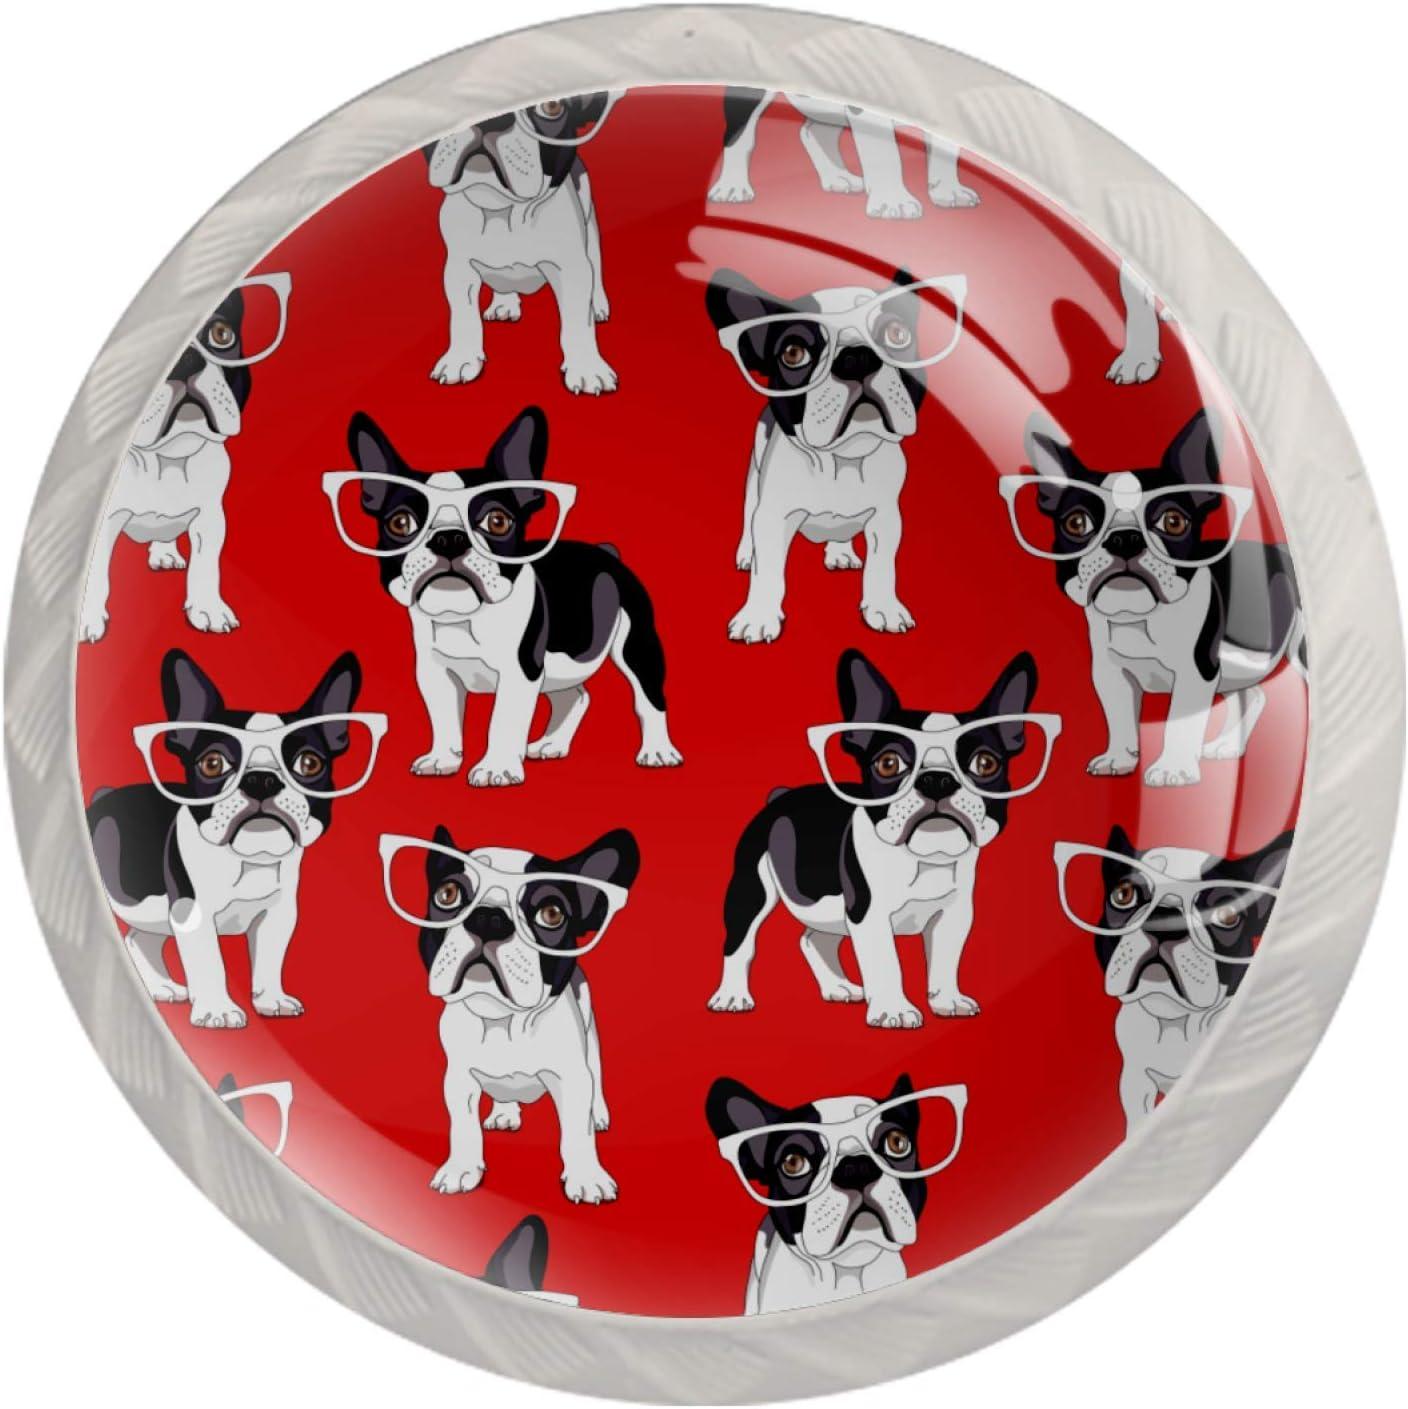 Lenergy White Cabinet Knobs Bulldog with Glasses Drawer Knobs Mo